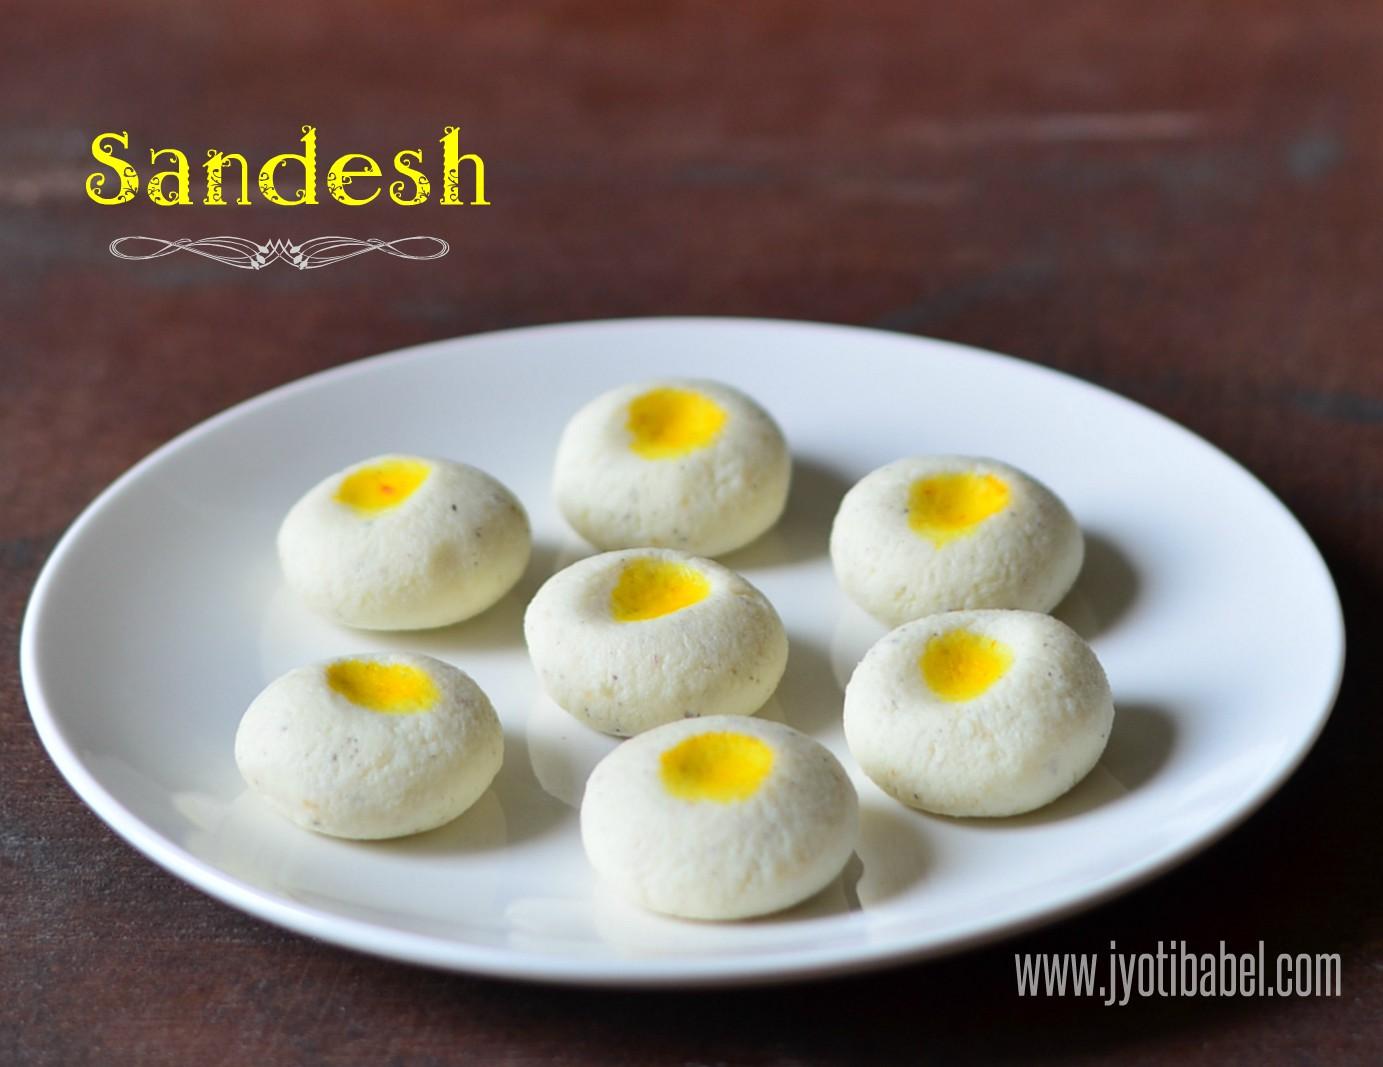 Jyotis pages sandesh sondesh recipe how to make sandesh sandesh sondesh is a traditional bengali sweet sandesh recipe how to make sandesh forumfinder Gallery